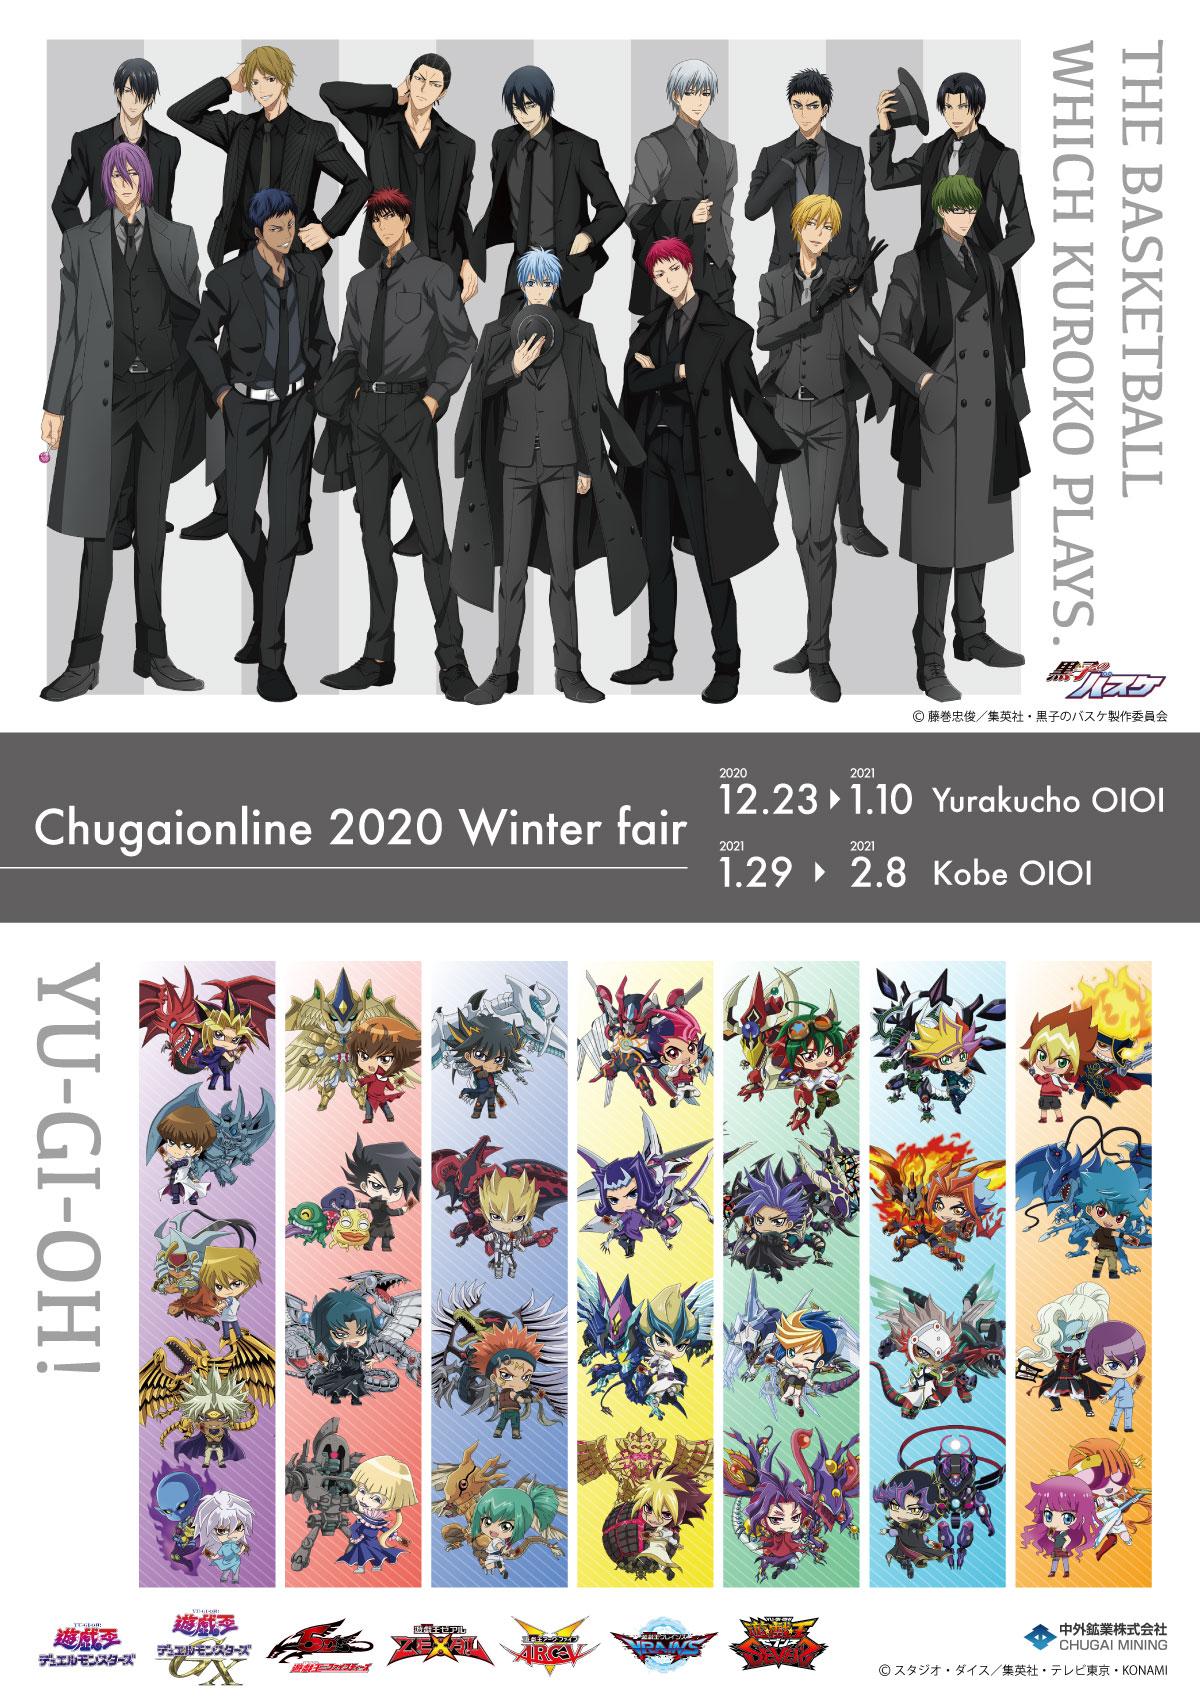 「Chugaionline 2020 Winter fair in マルイ」メインビジュアル